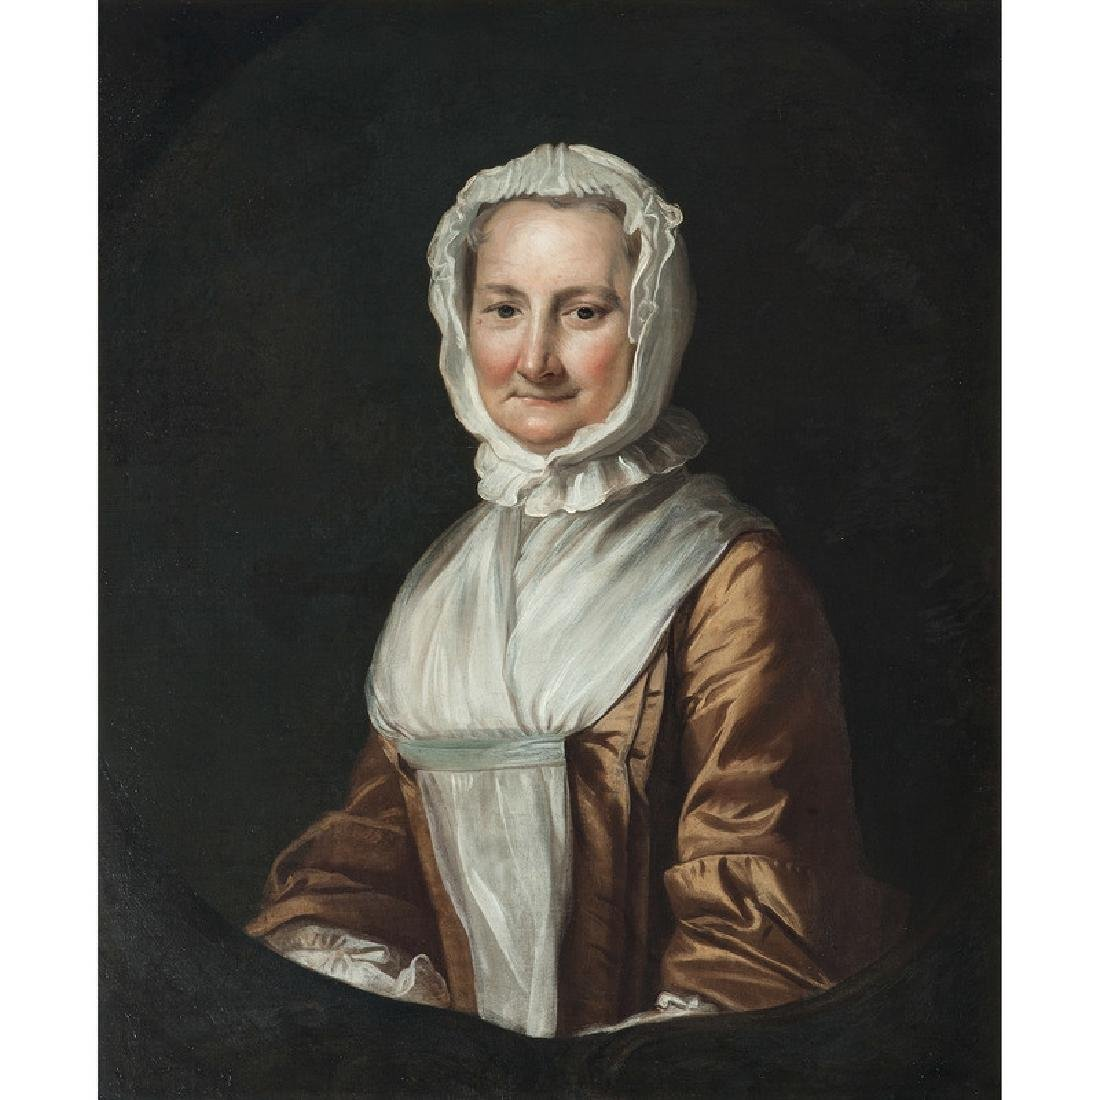 American Portrait of a Woman in a White Bonnet - 2